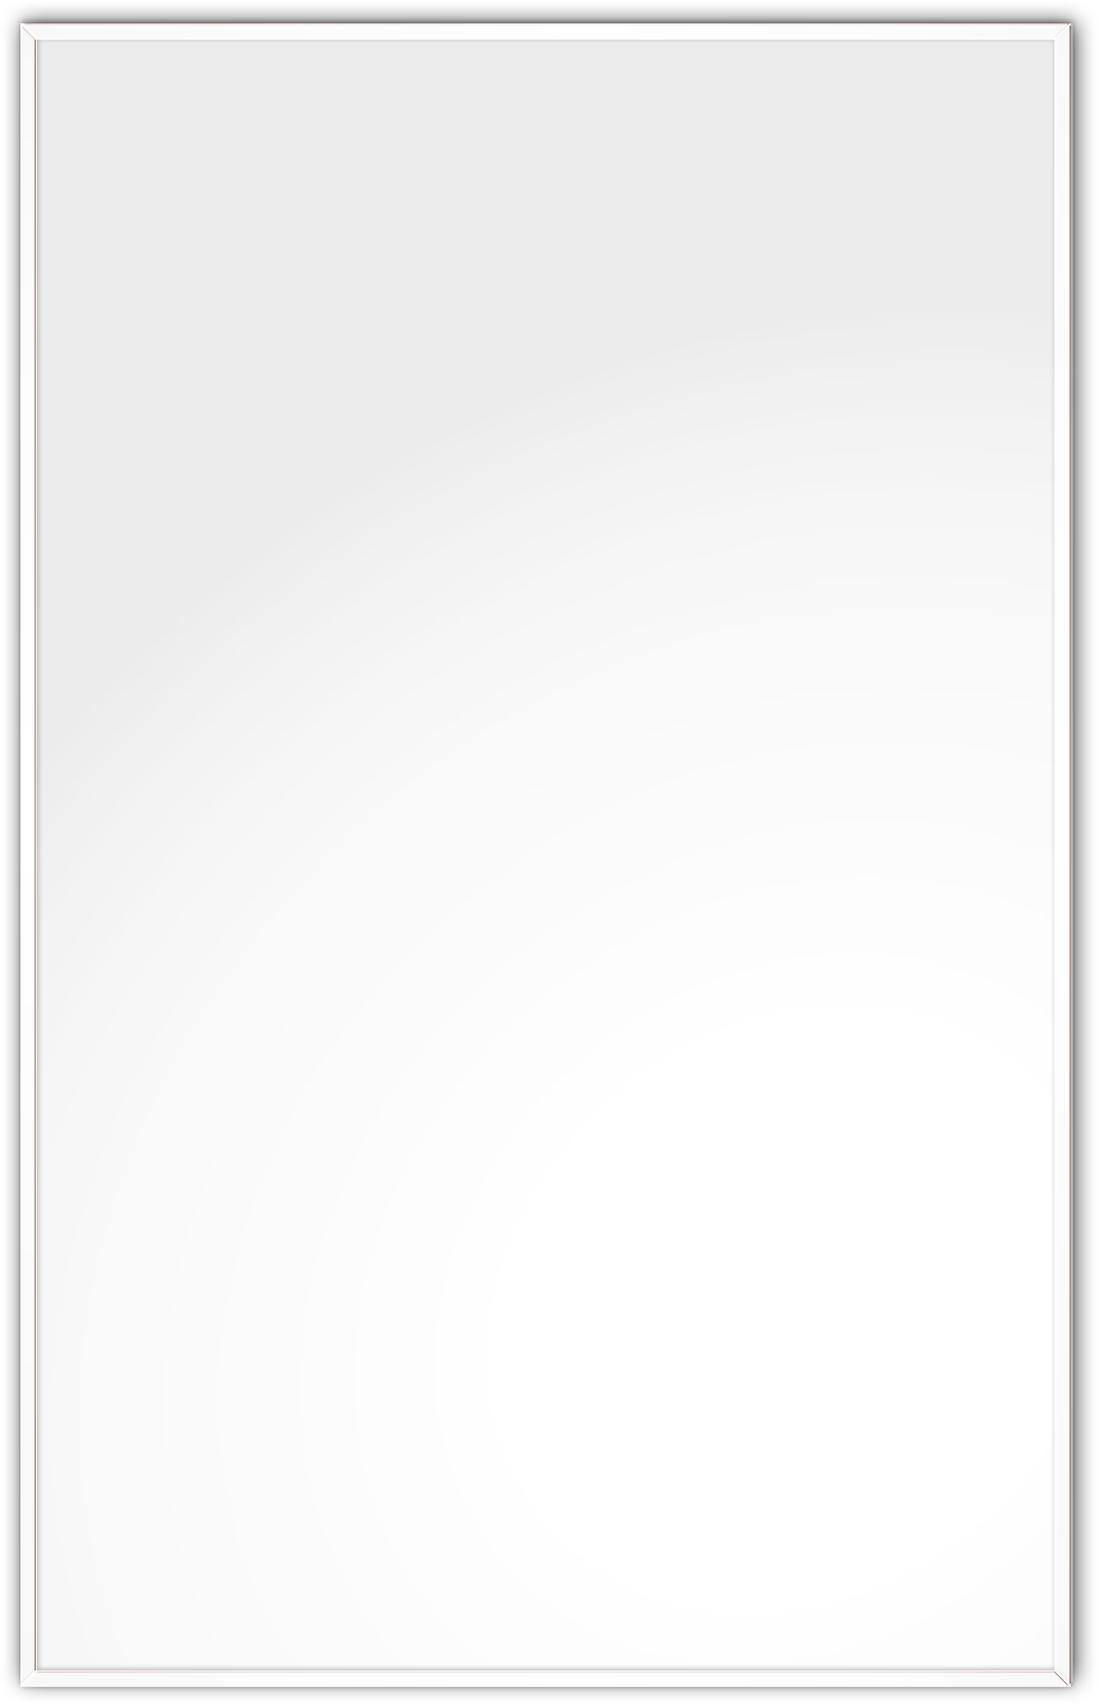 comfort2000 ir. verw.paneel, 1025W, 1206 x 746 mm, lelie wit, lijst lelie wit, U-Line elegance, uitsluitend voor easyPlan vertikaal